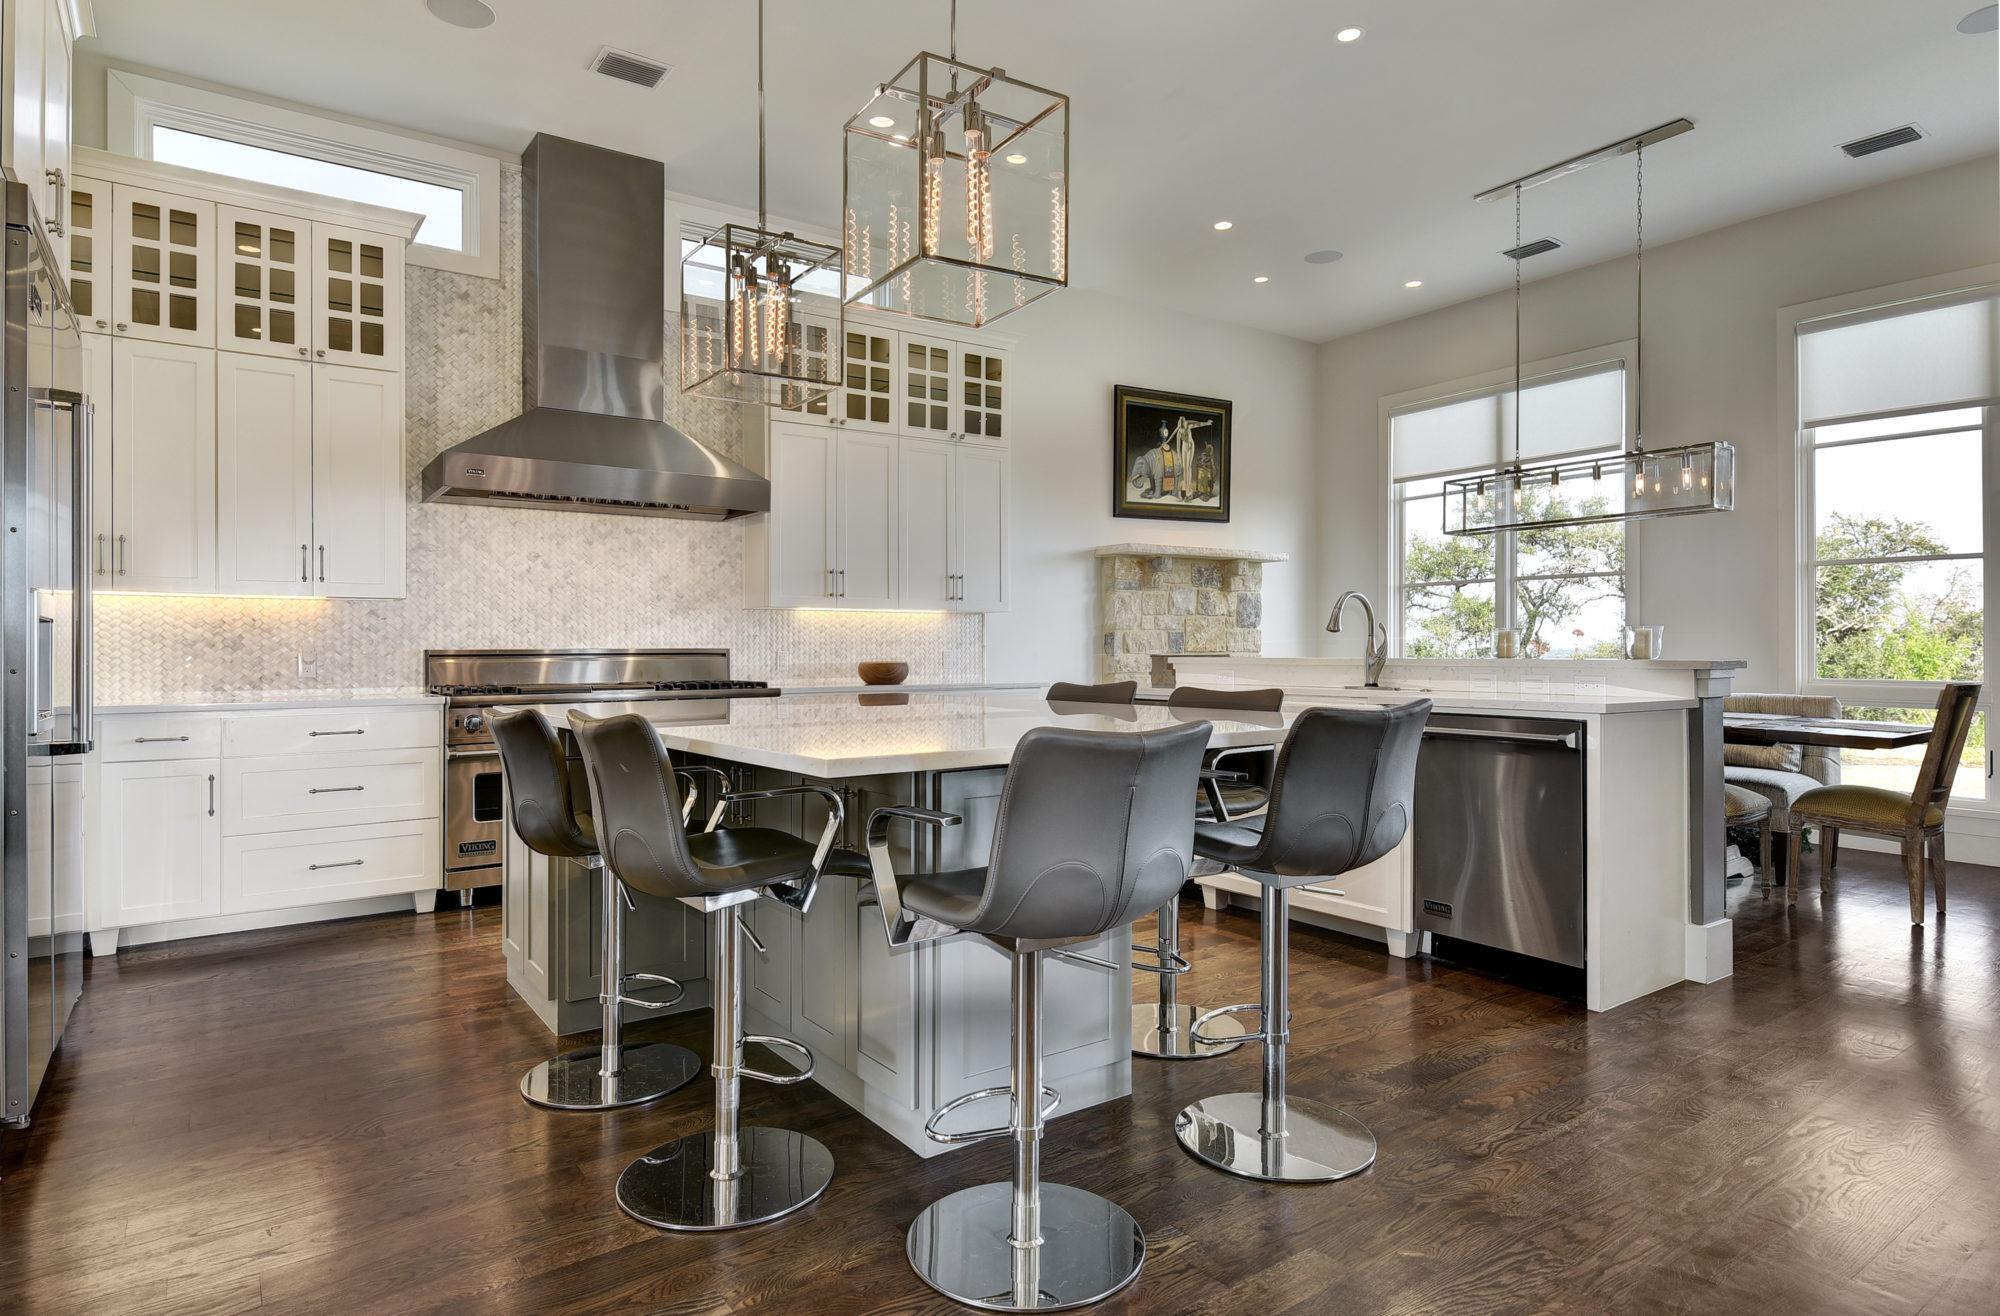 Next Level Austin Residential Commercial Interior Design In Austin Texas